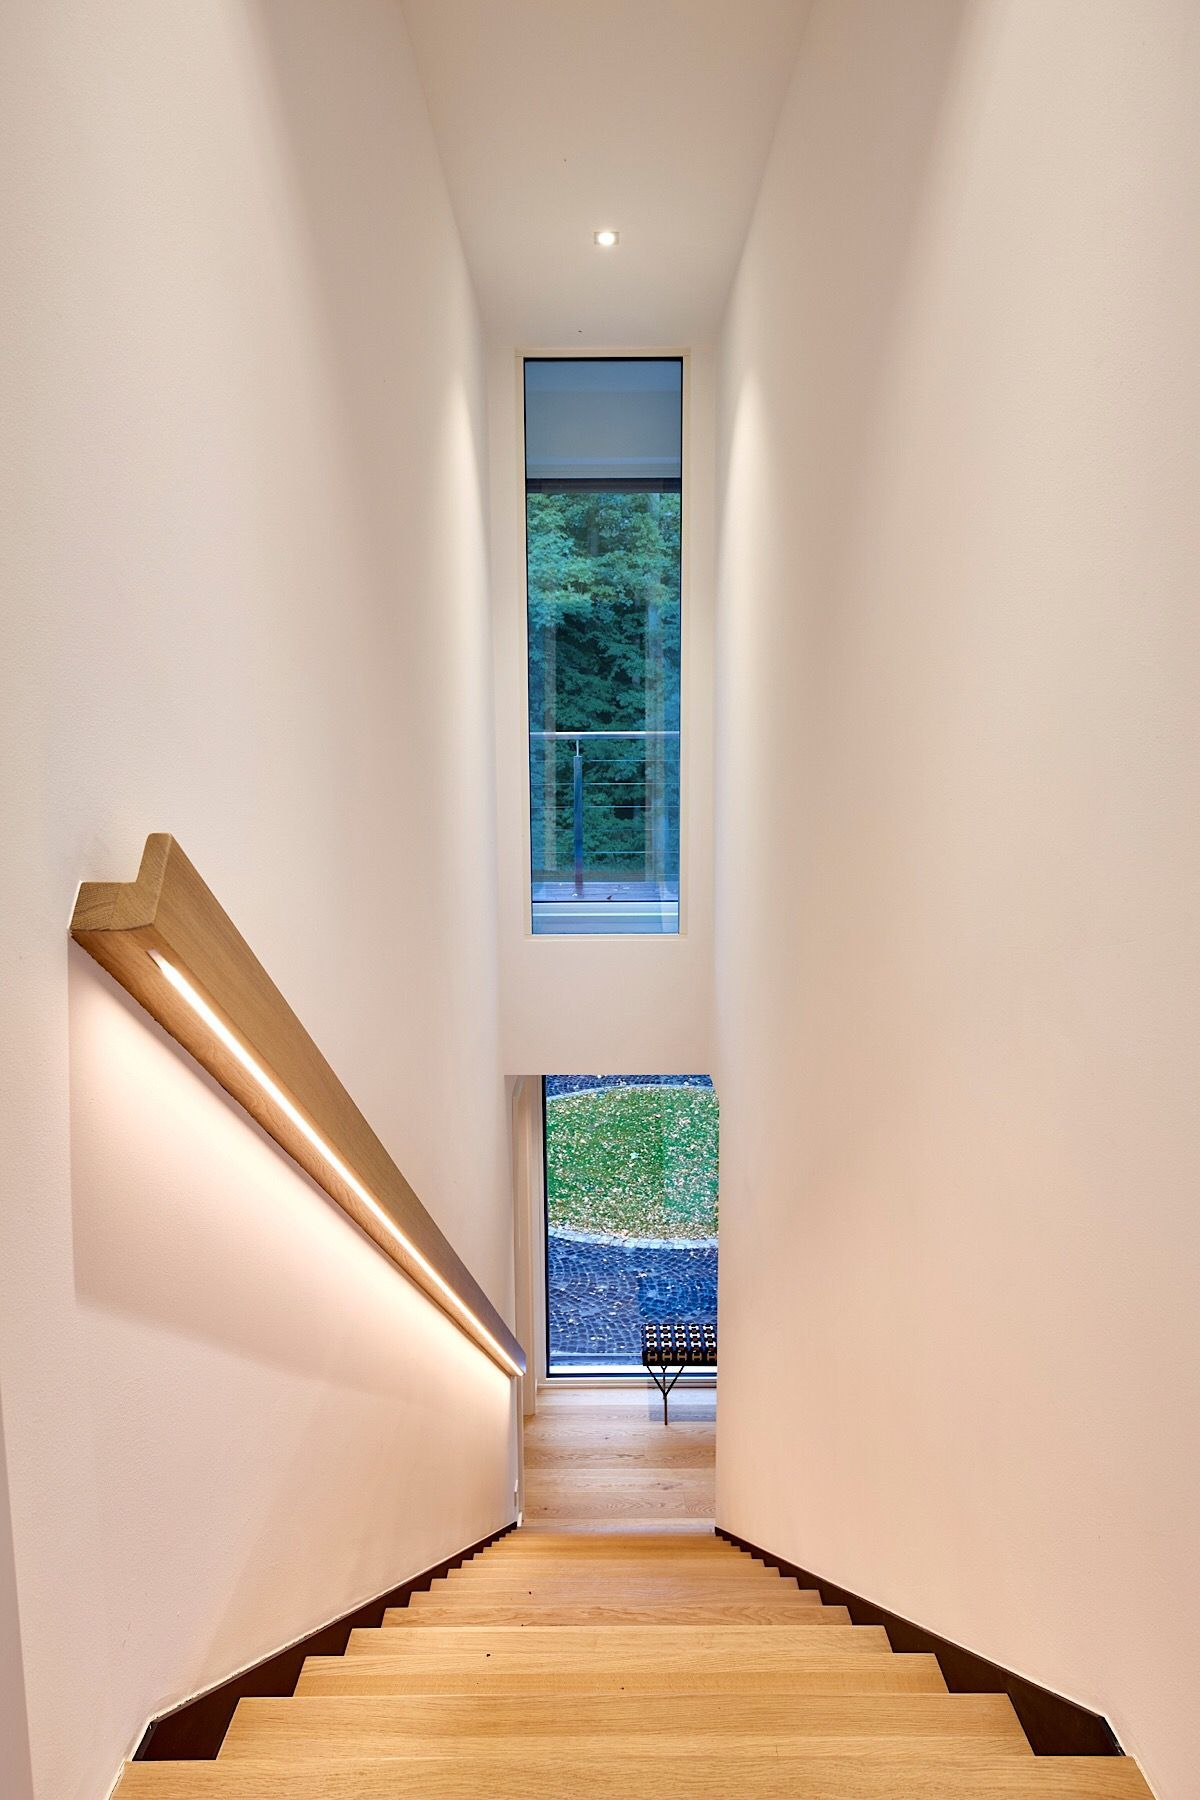 Architektenhaus MEHRBLICK modern im Bauhausstil - Baufritz | HausbauDirekt.de